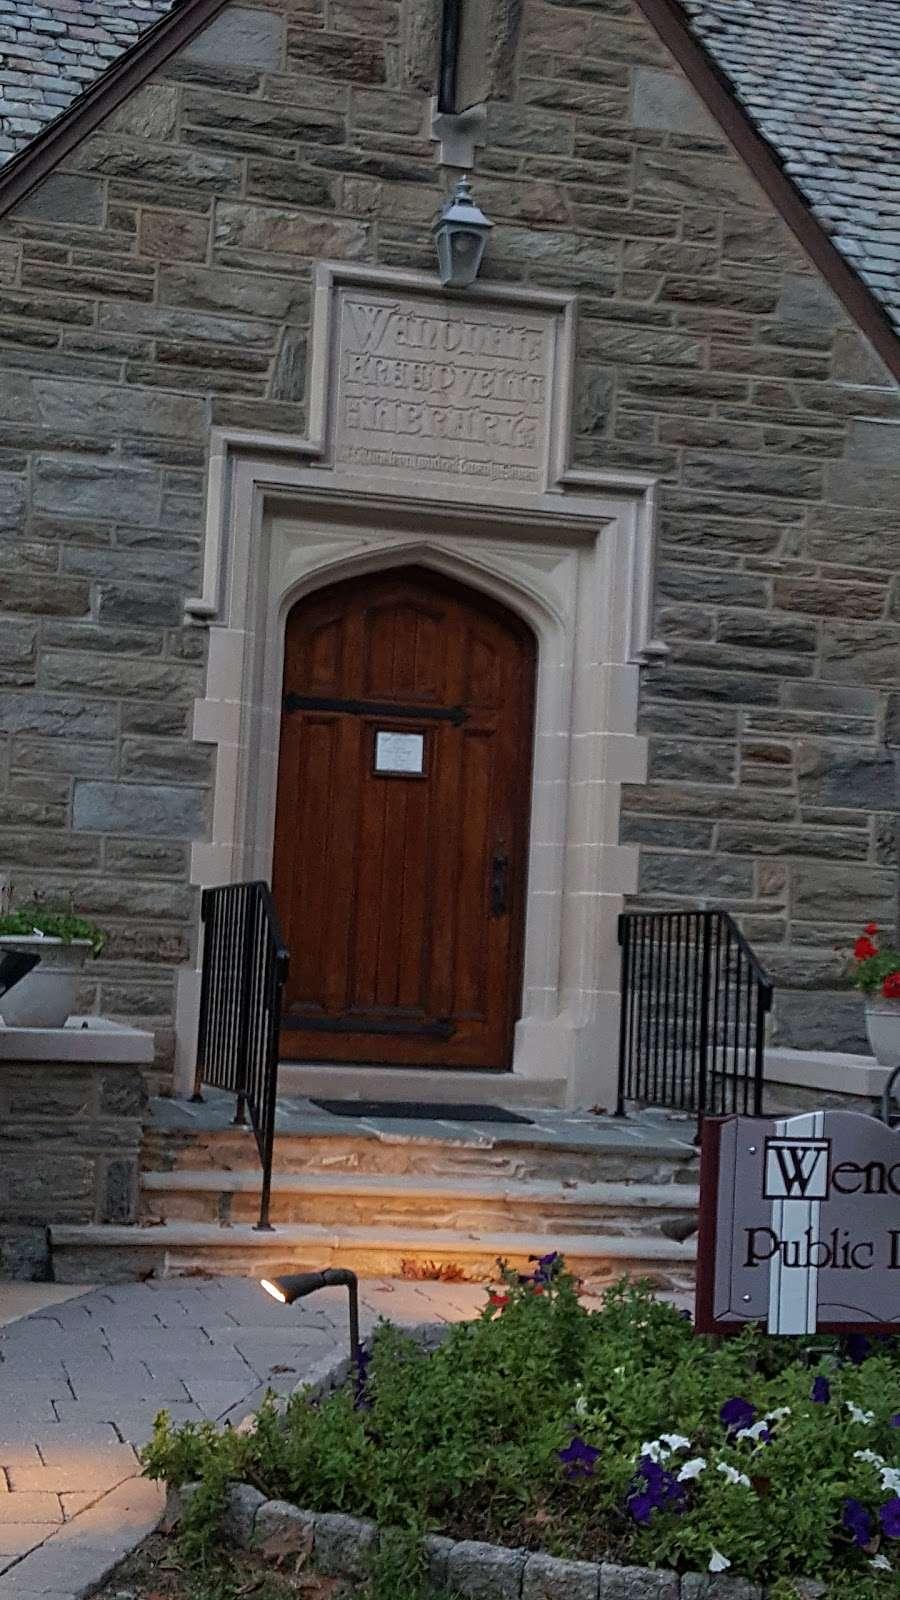 Wenonah Free Public Library - library    Photo 6 of 10   Address: 101 E Mantua Ave, Wenonah, NJ 08090, USA   Phone: (856) 468-6323